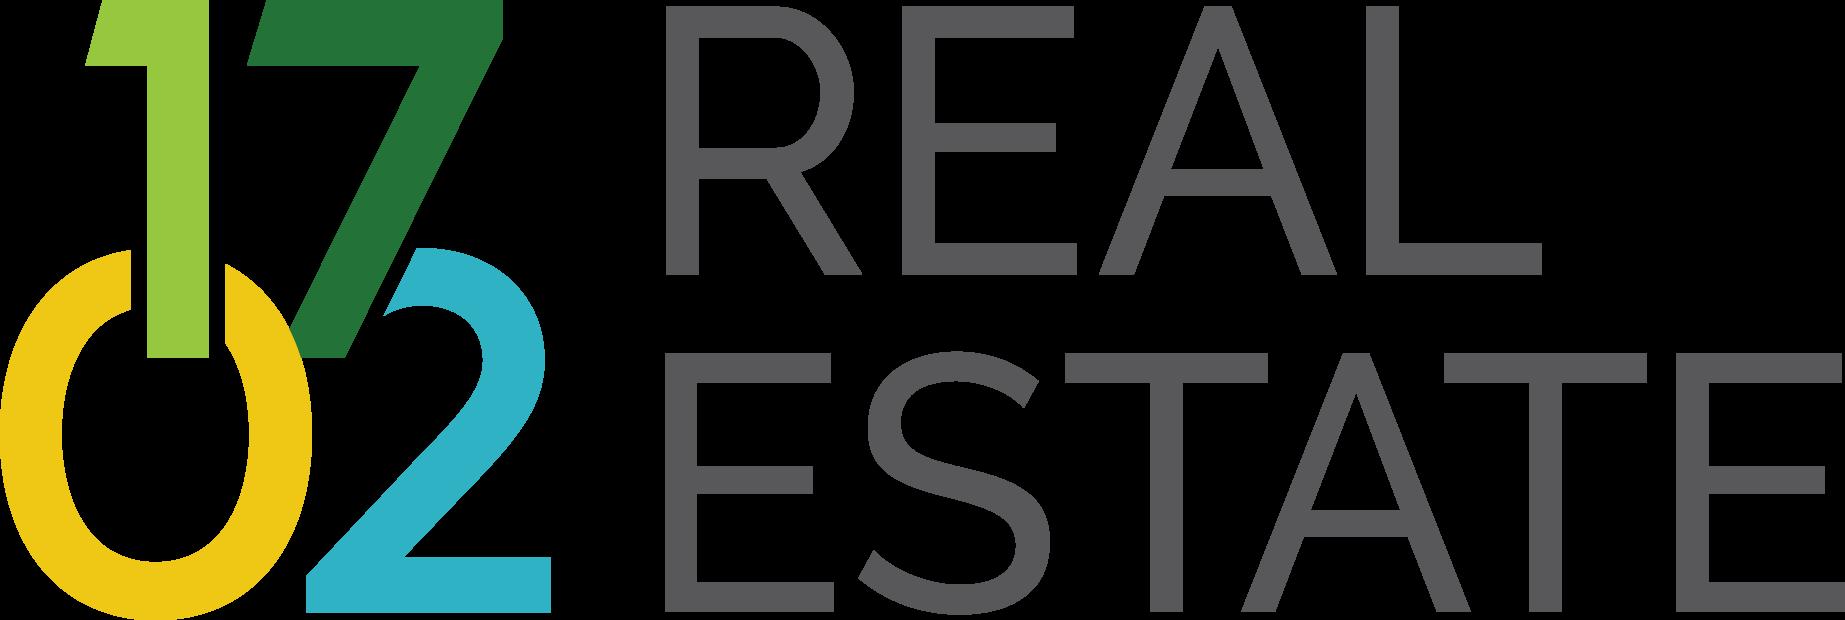 1702 Real Estate